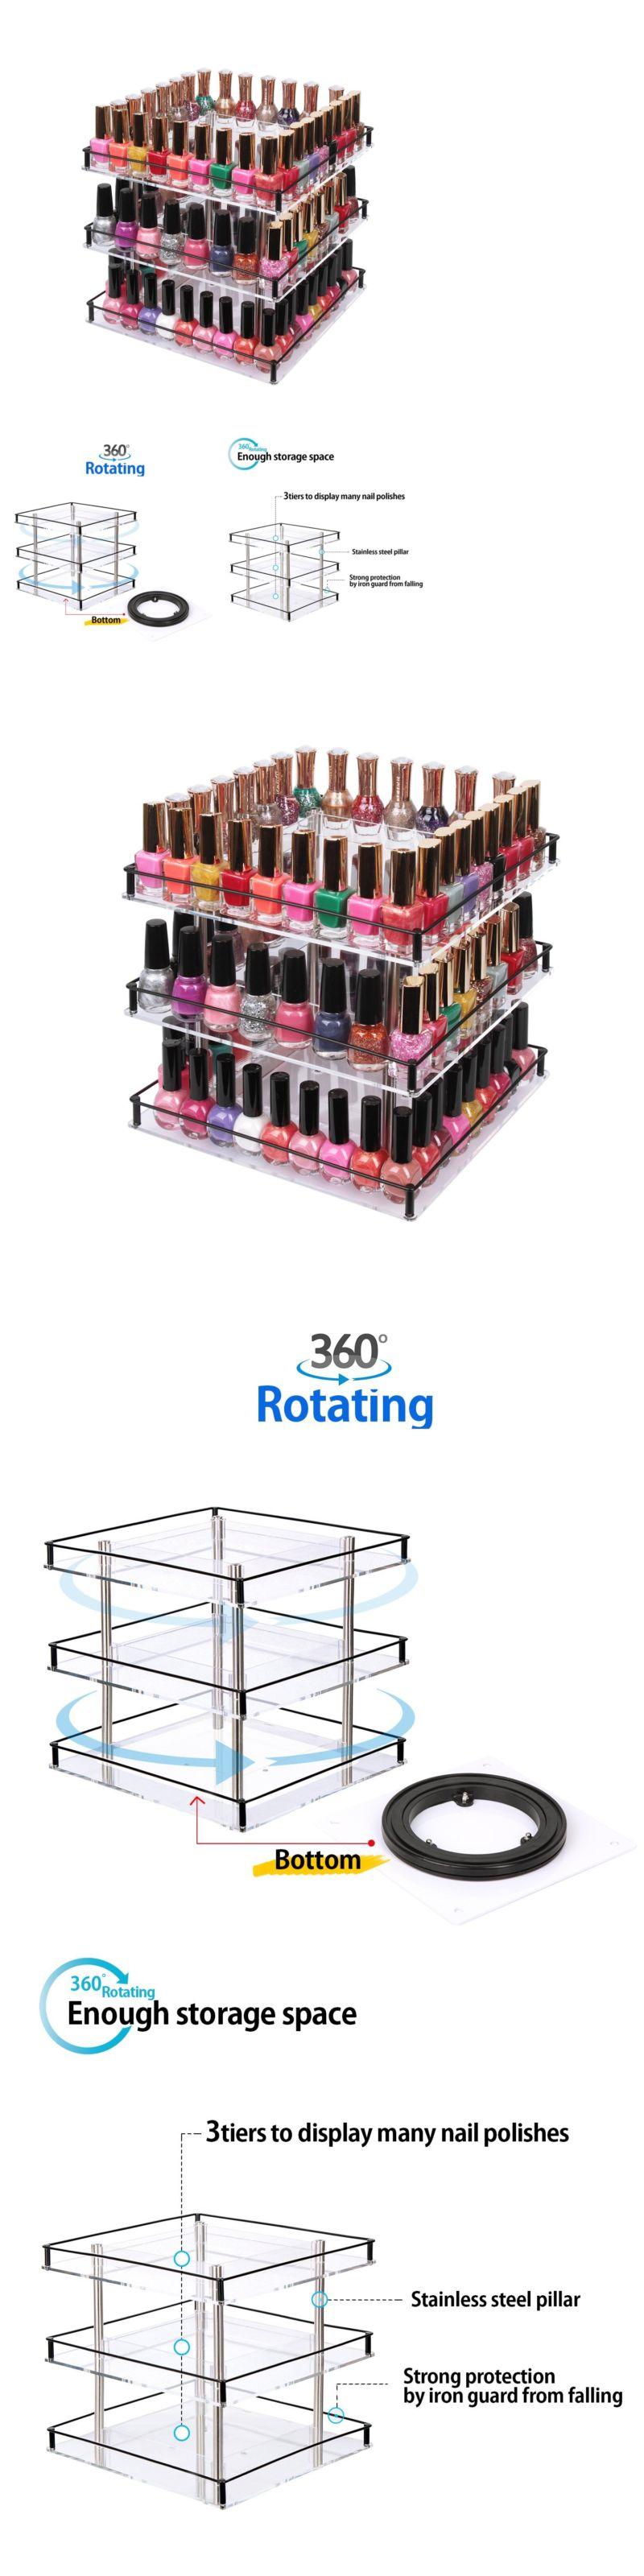 Acrylic Nail Polish Rack Ebay - CrossfitHPU